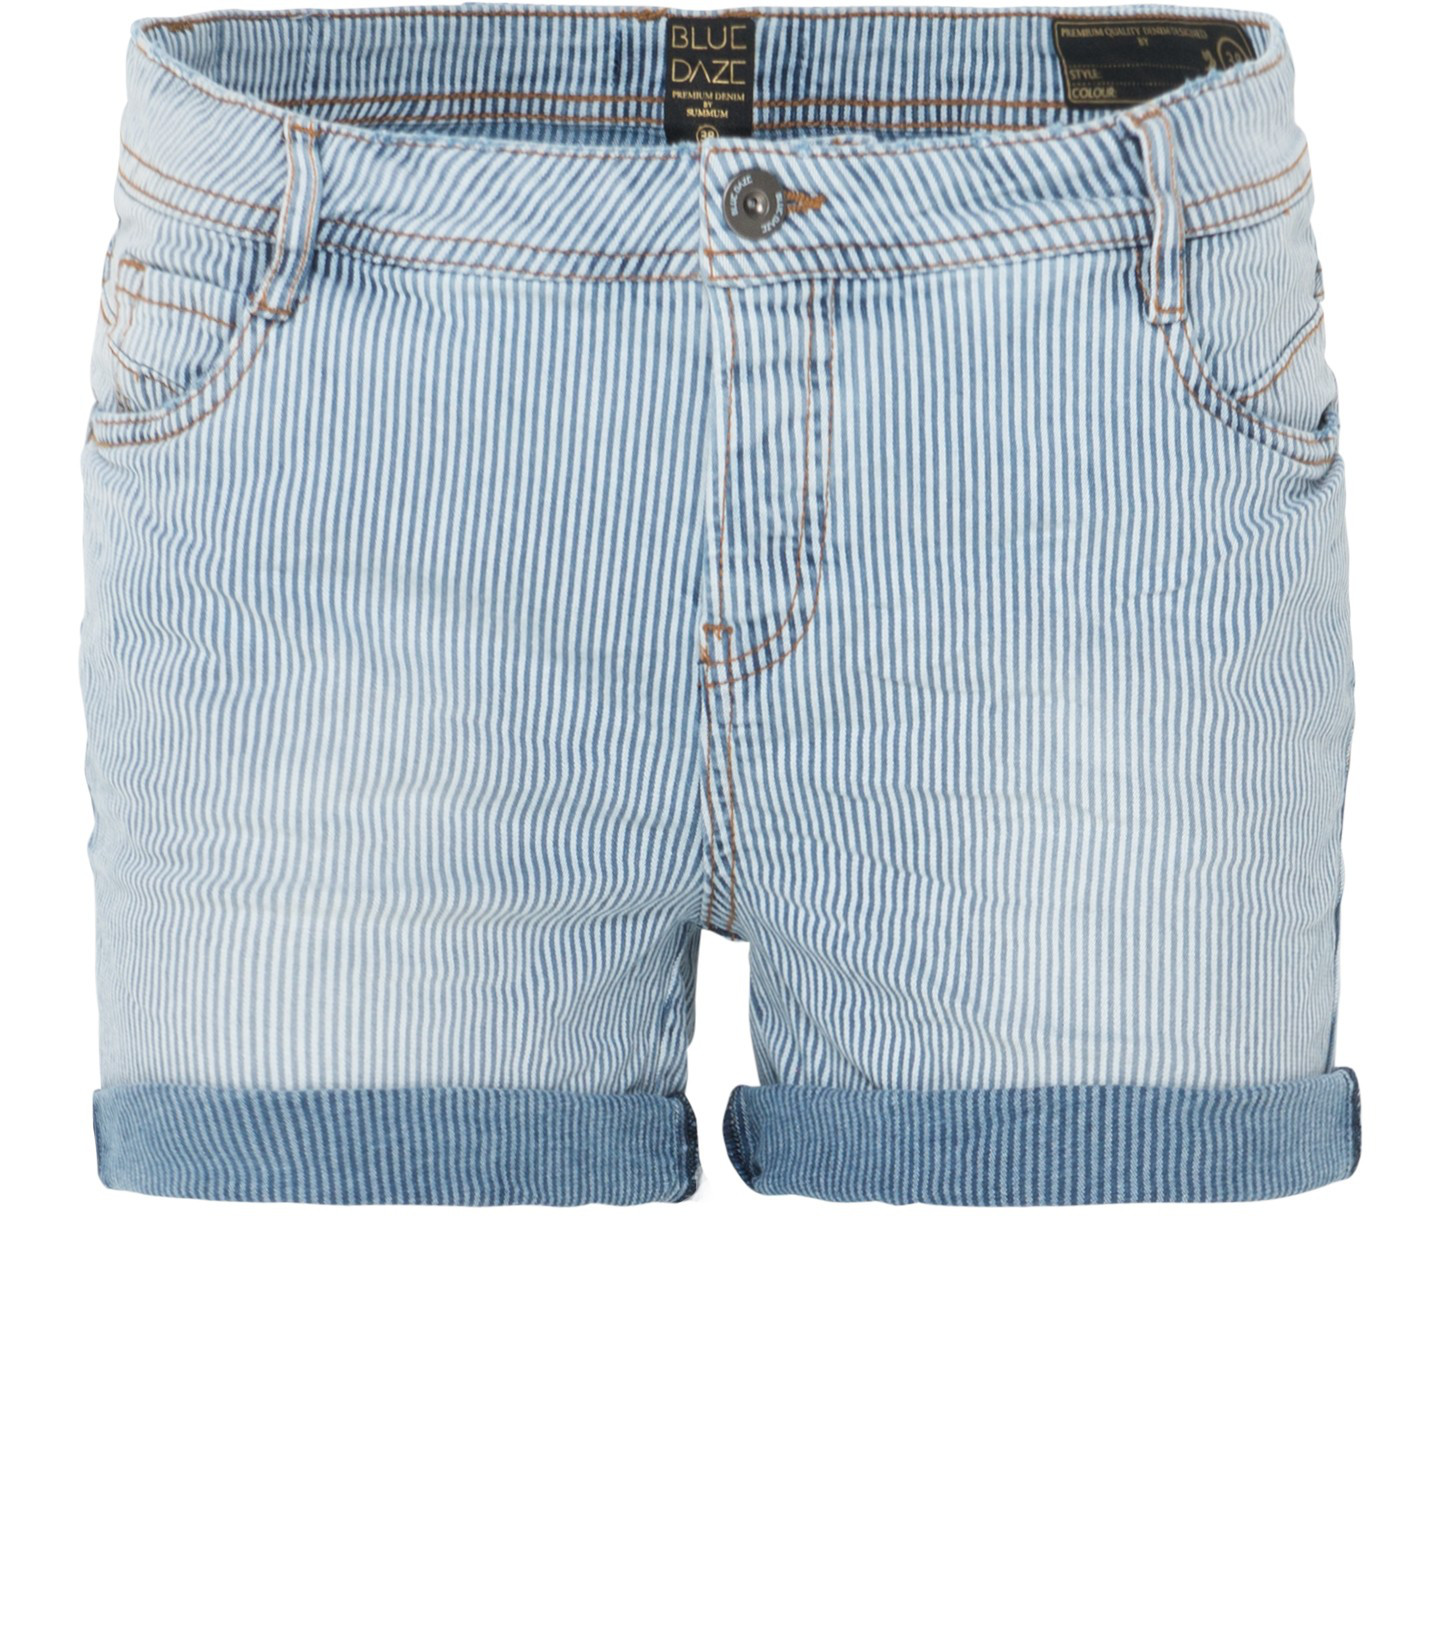 Lichtblauw gestreepte dames korte broek Summum - 4s1496